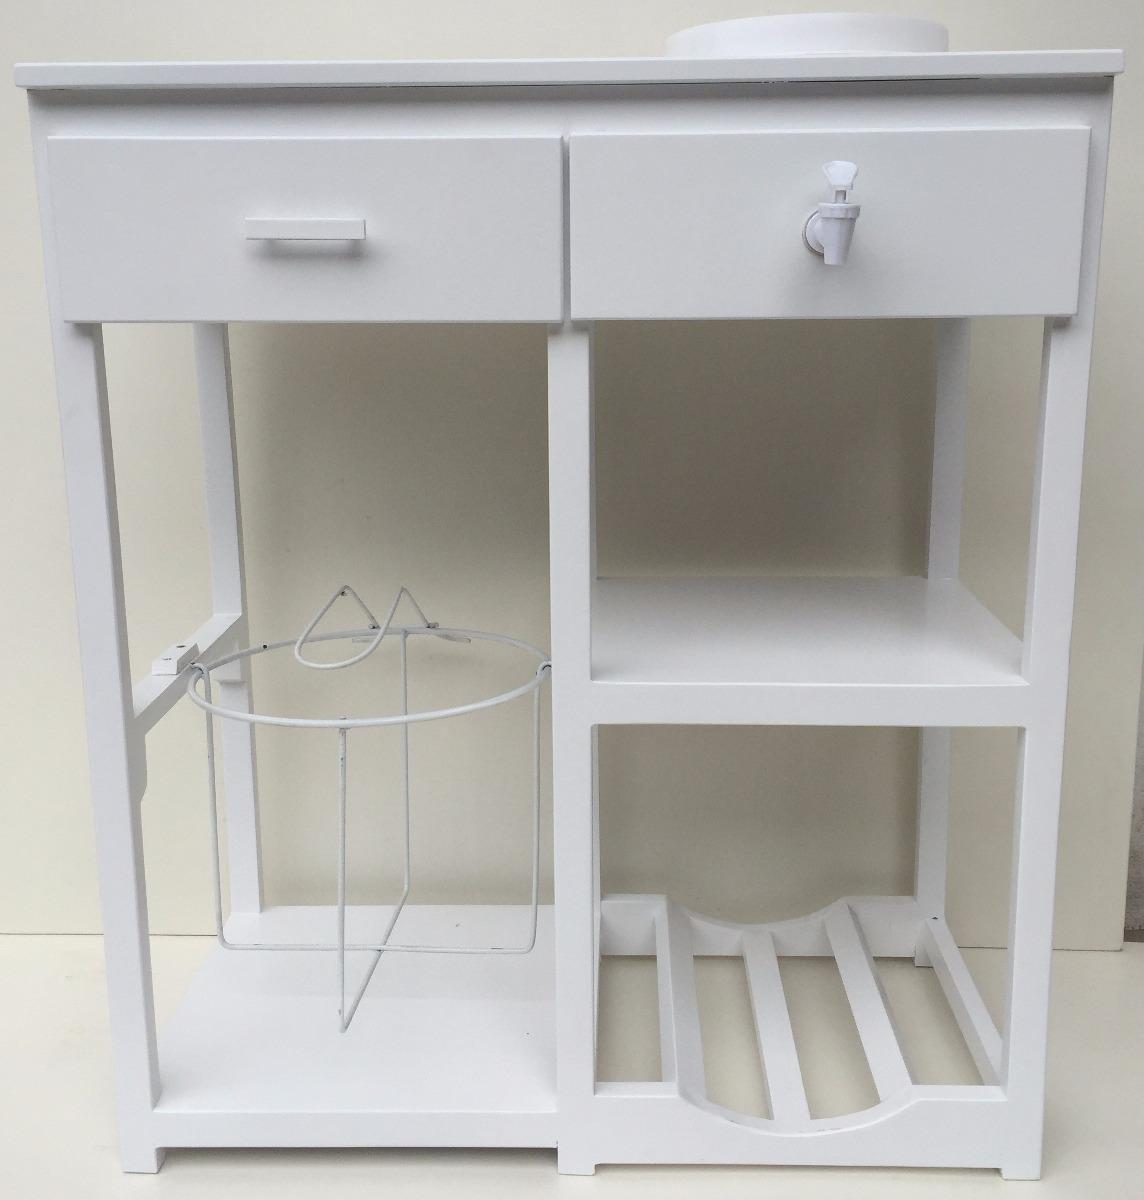 Dispensador de agua y porta garrafones 2 en for Mueble para calentador de agua